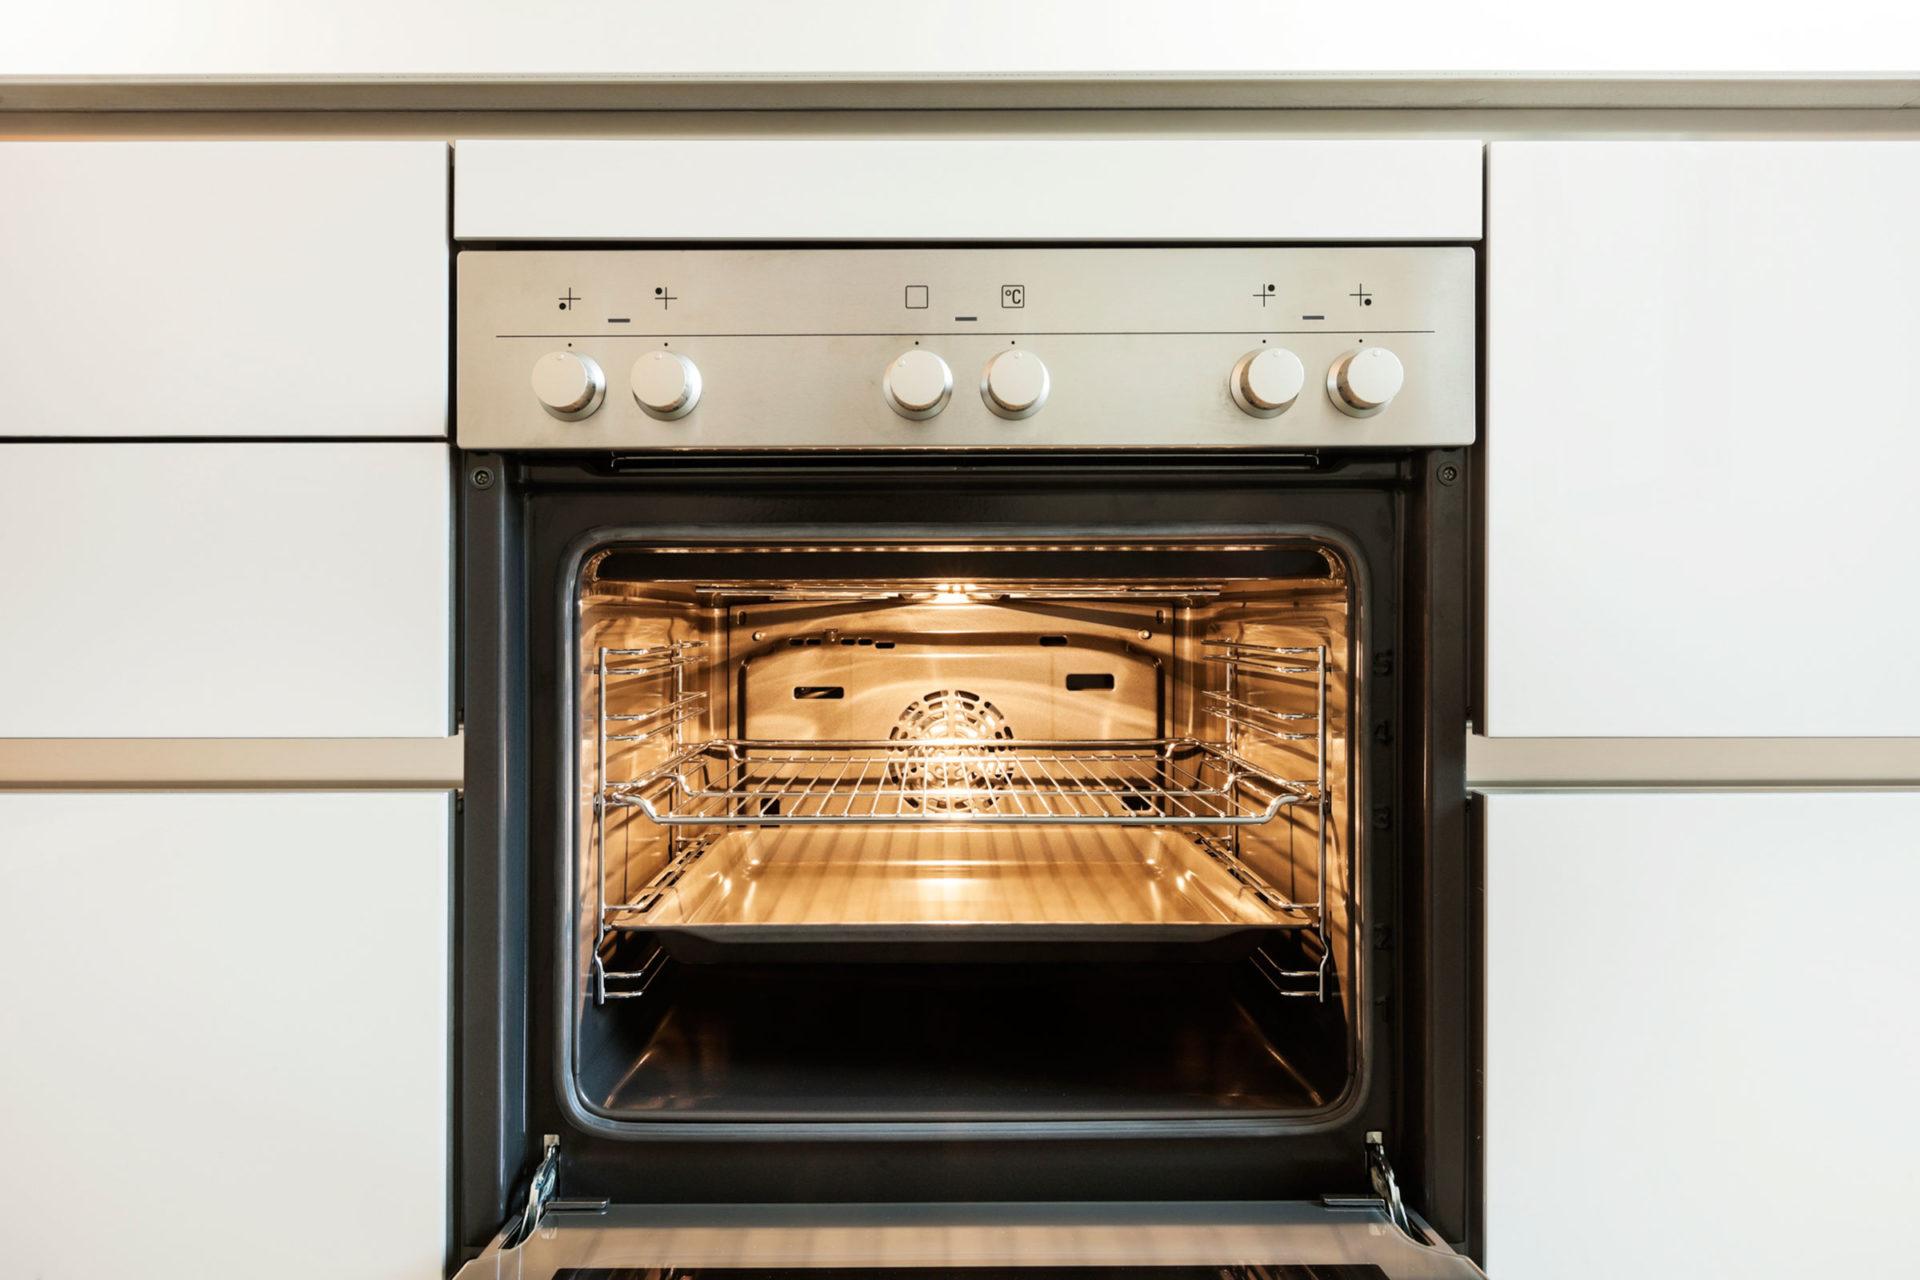 Ketahui beda oven tangkring listrik gas sebelum beli resepkoki mengenal oven tangkring listrik dan gas ccuart Gallery